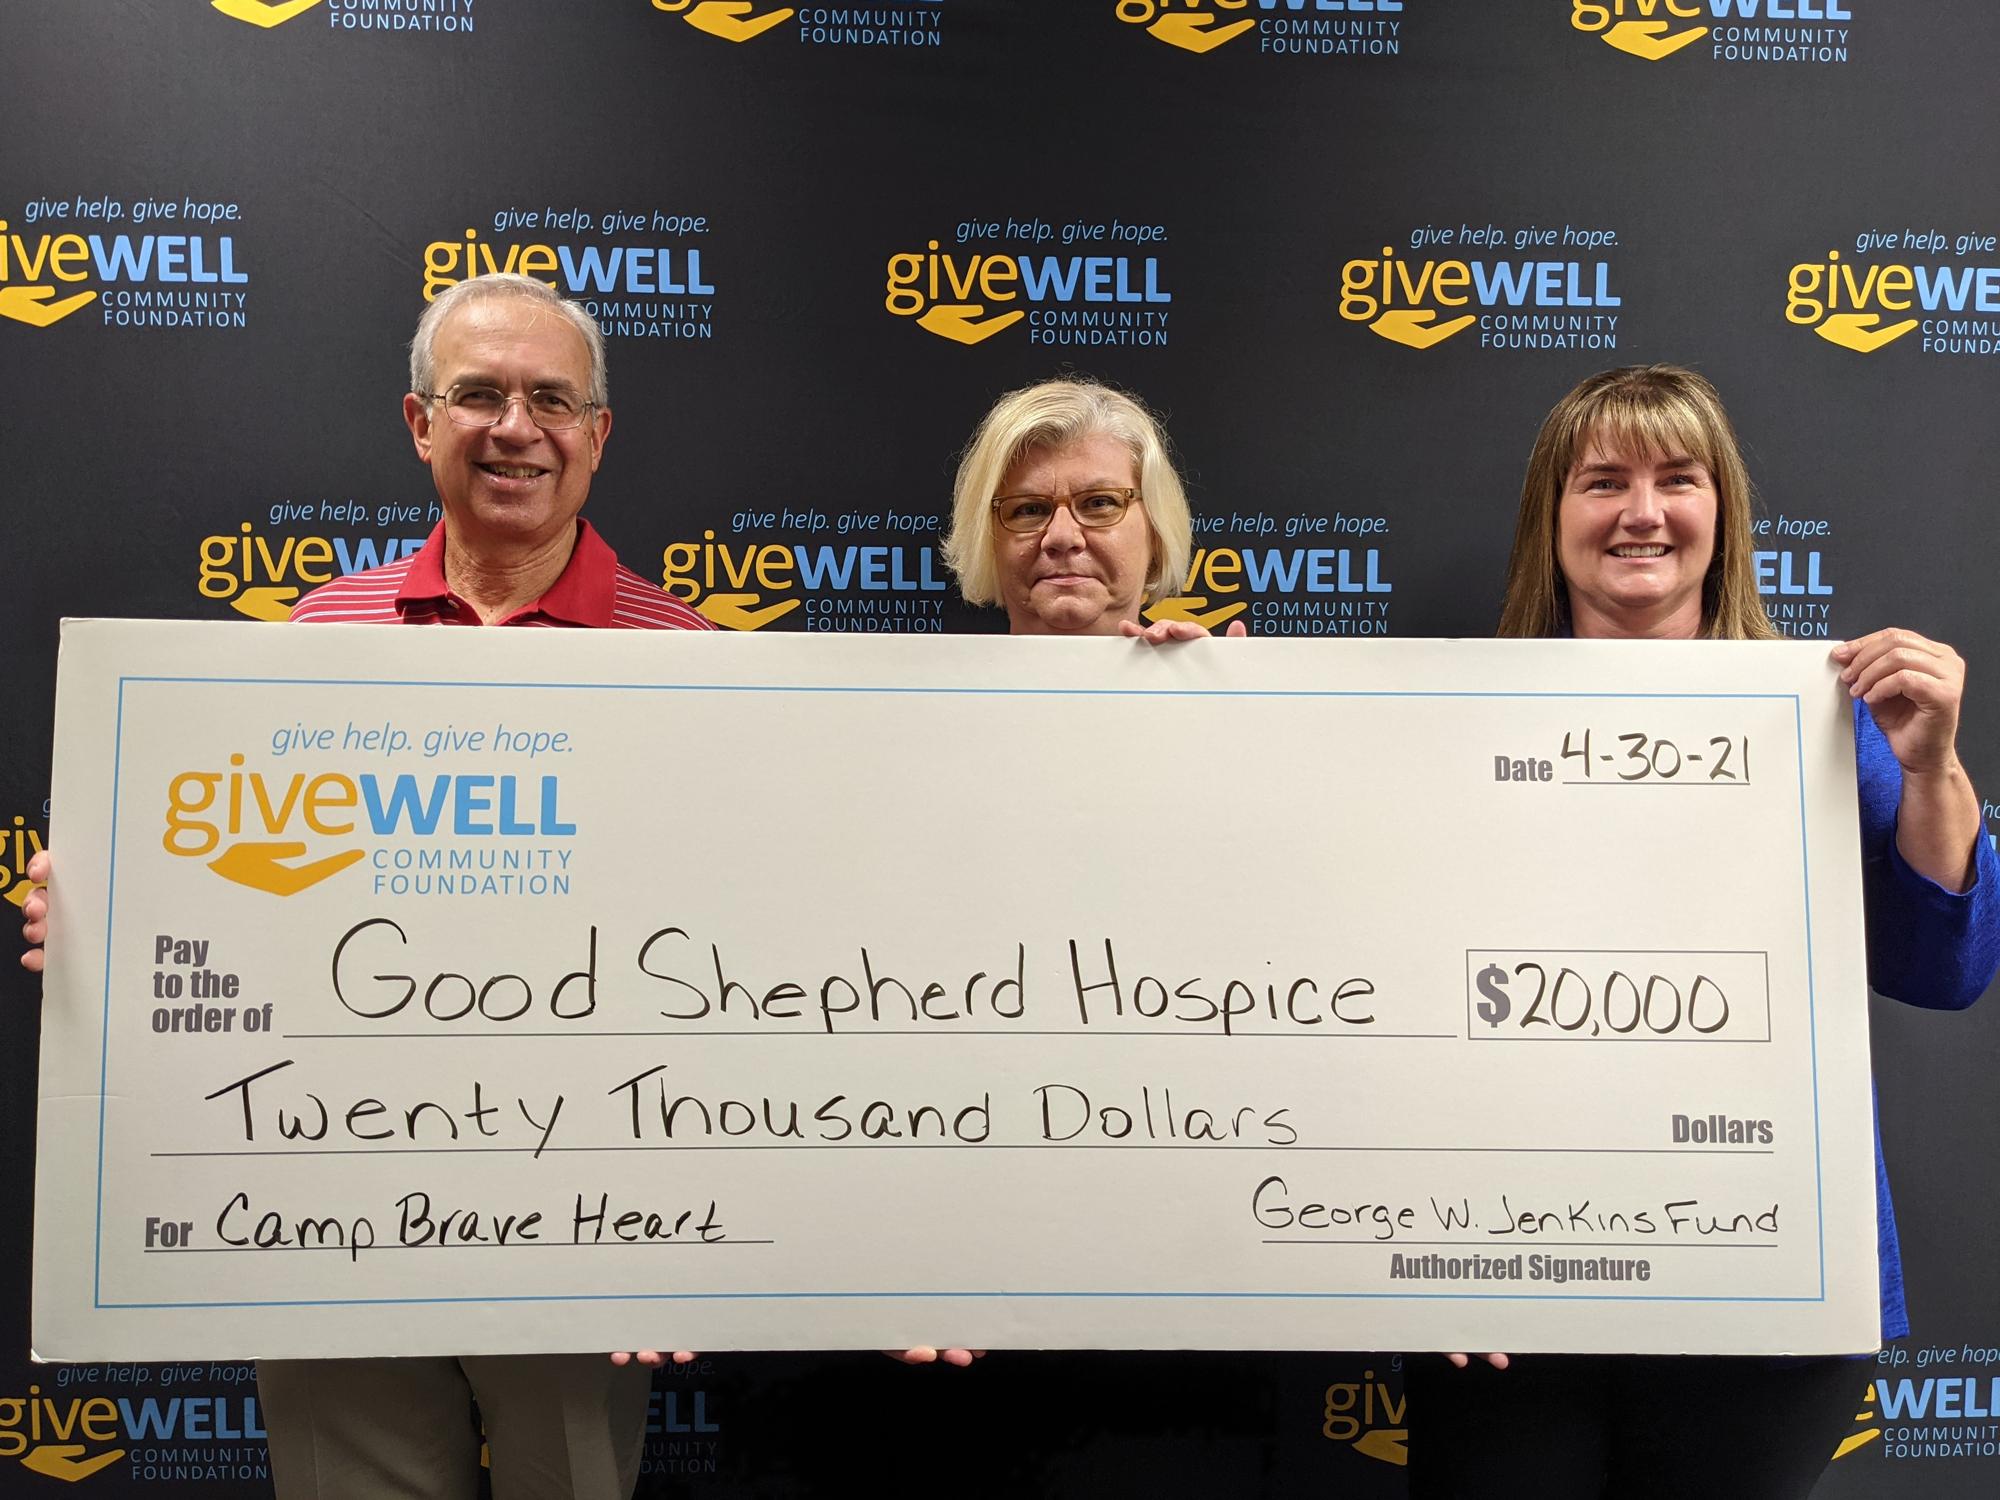 Impact Polk check presentation with Good Shepard Hospice